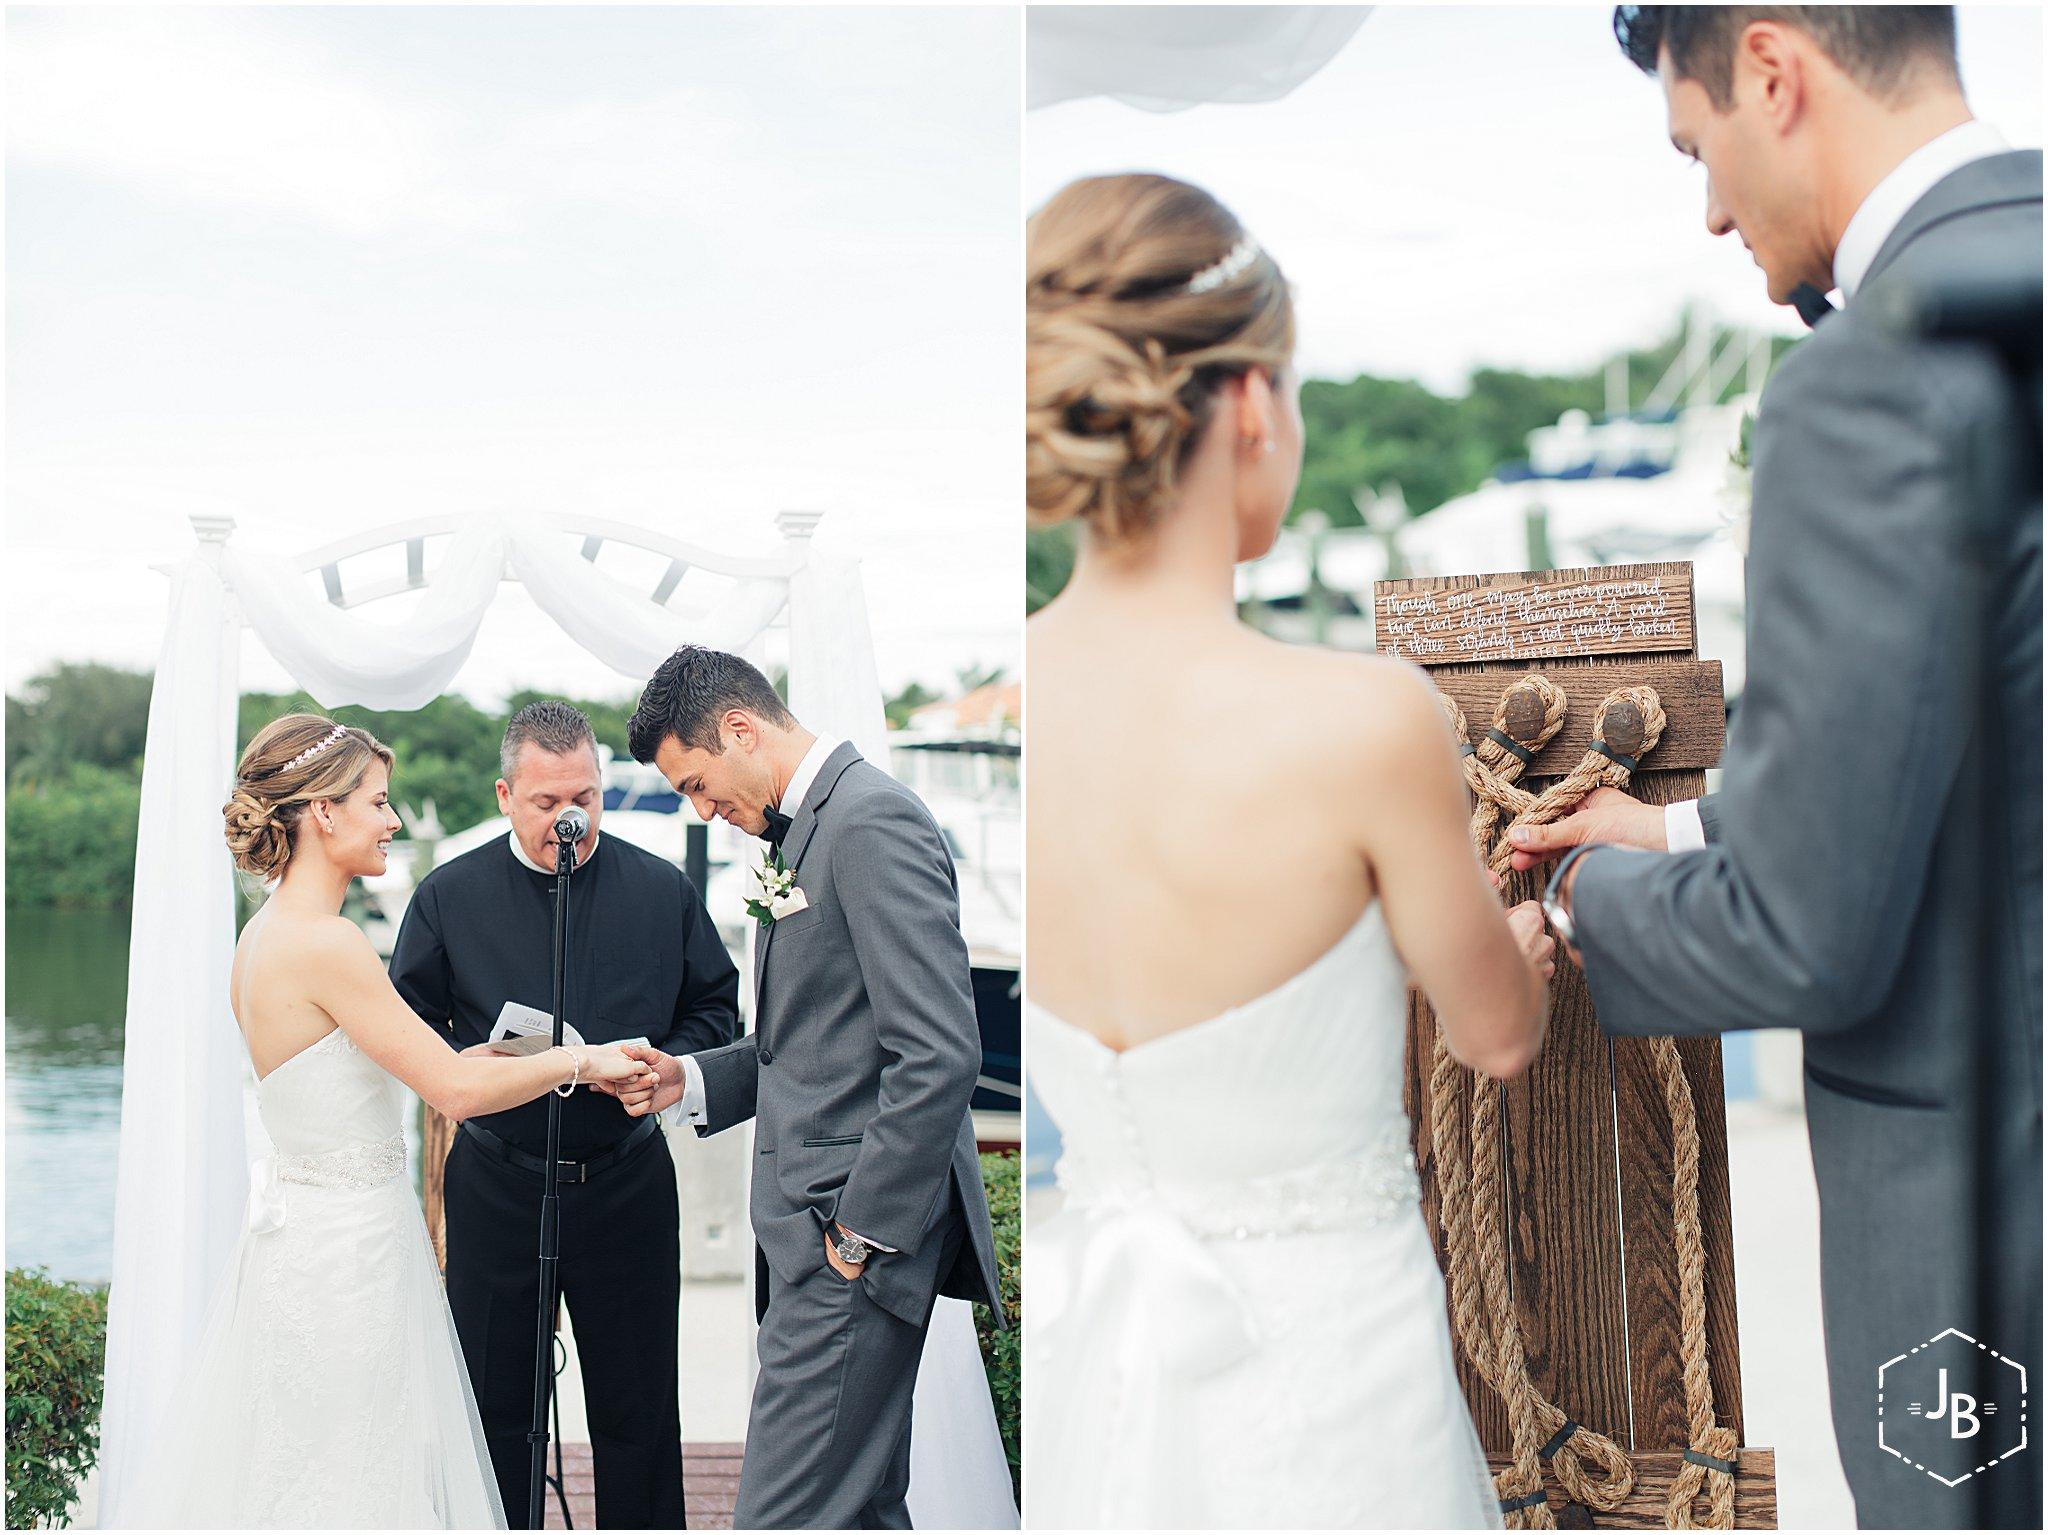 WeddingandEngagementFloridaPhotographer_0352.jpg